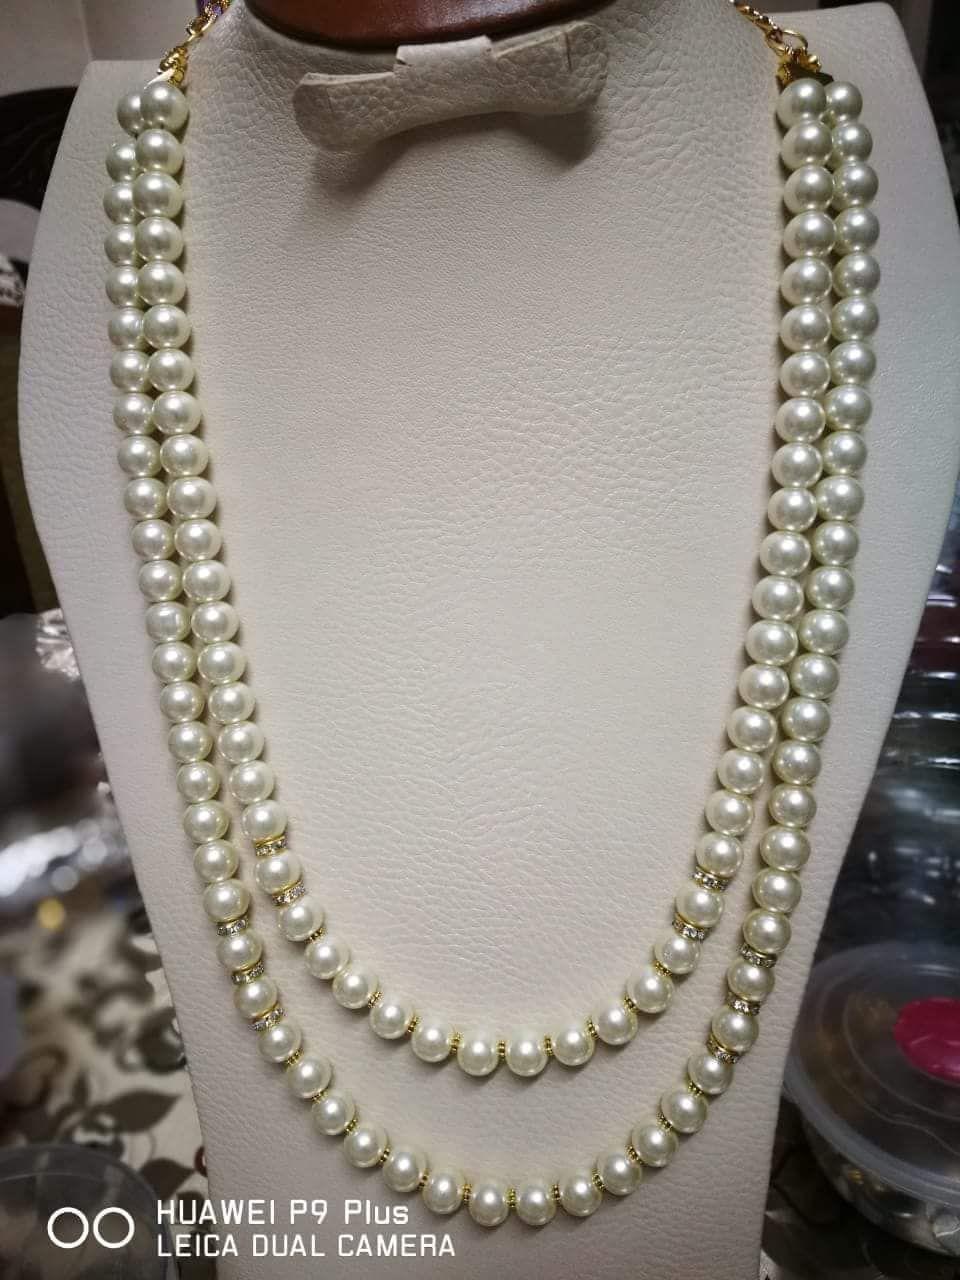 عقد لولي اوف وايت طويل دورين للمحجبات هاند ميد Handmade Accessories Pearl Necklace Necklace